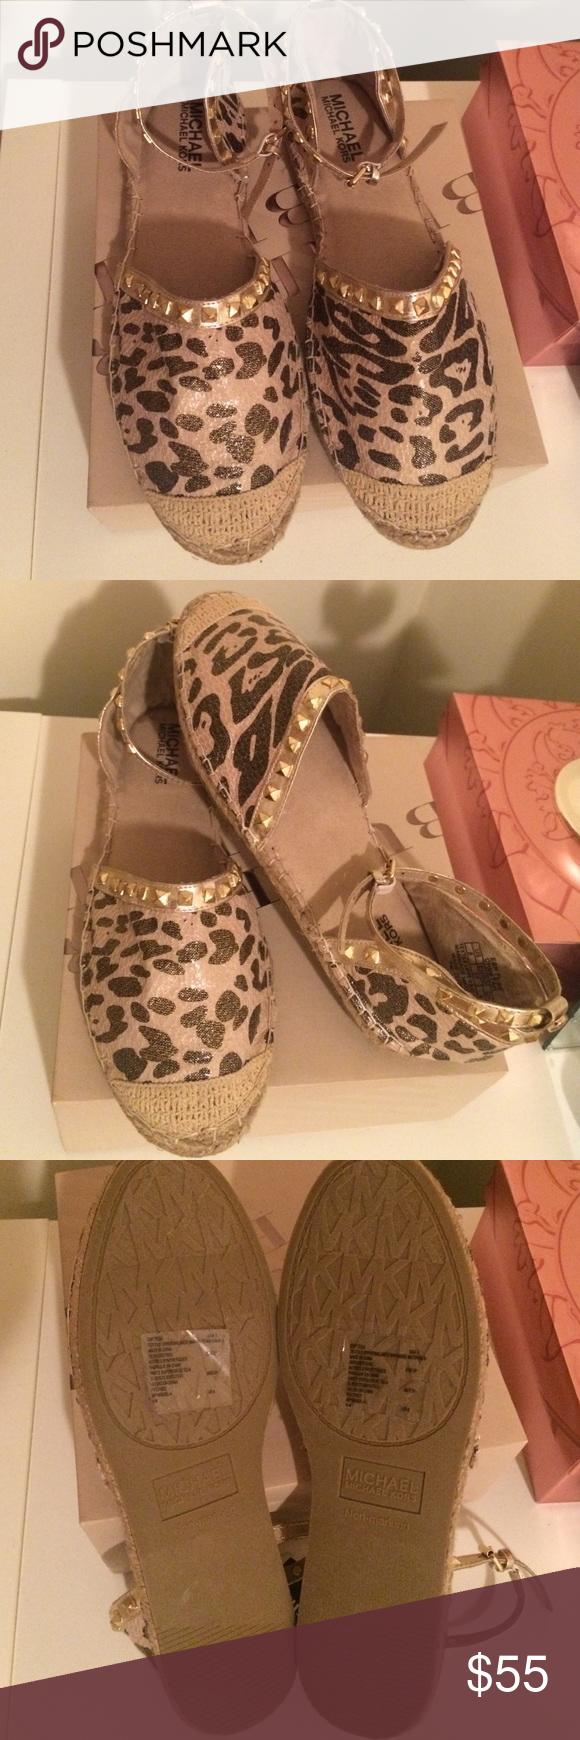 Michael Kors Flats Super Cute - Print MK (Without the box) Michael Kors Shoes Flats & Loafers